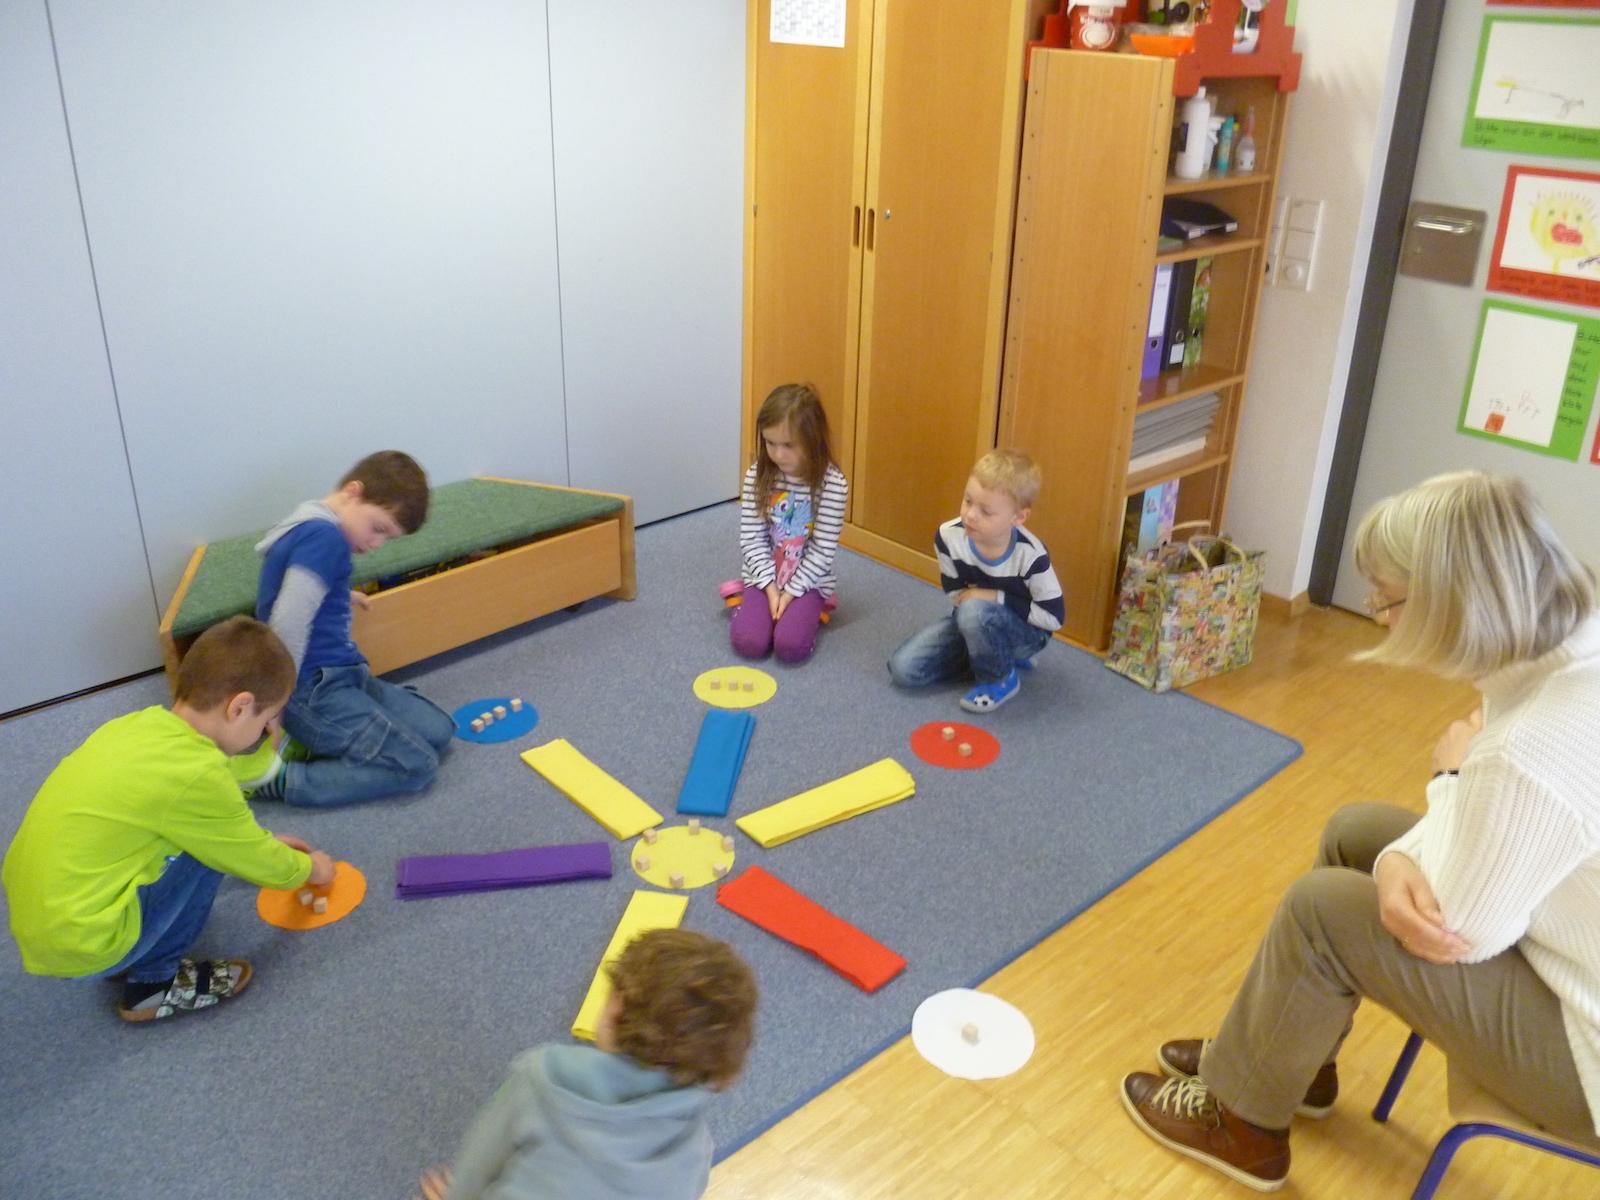 kooperation schule kindergarten gs ottenbach. Black Bedroom Furniture Sets. Home Design Ideas